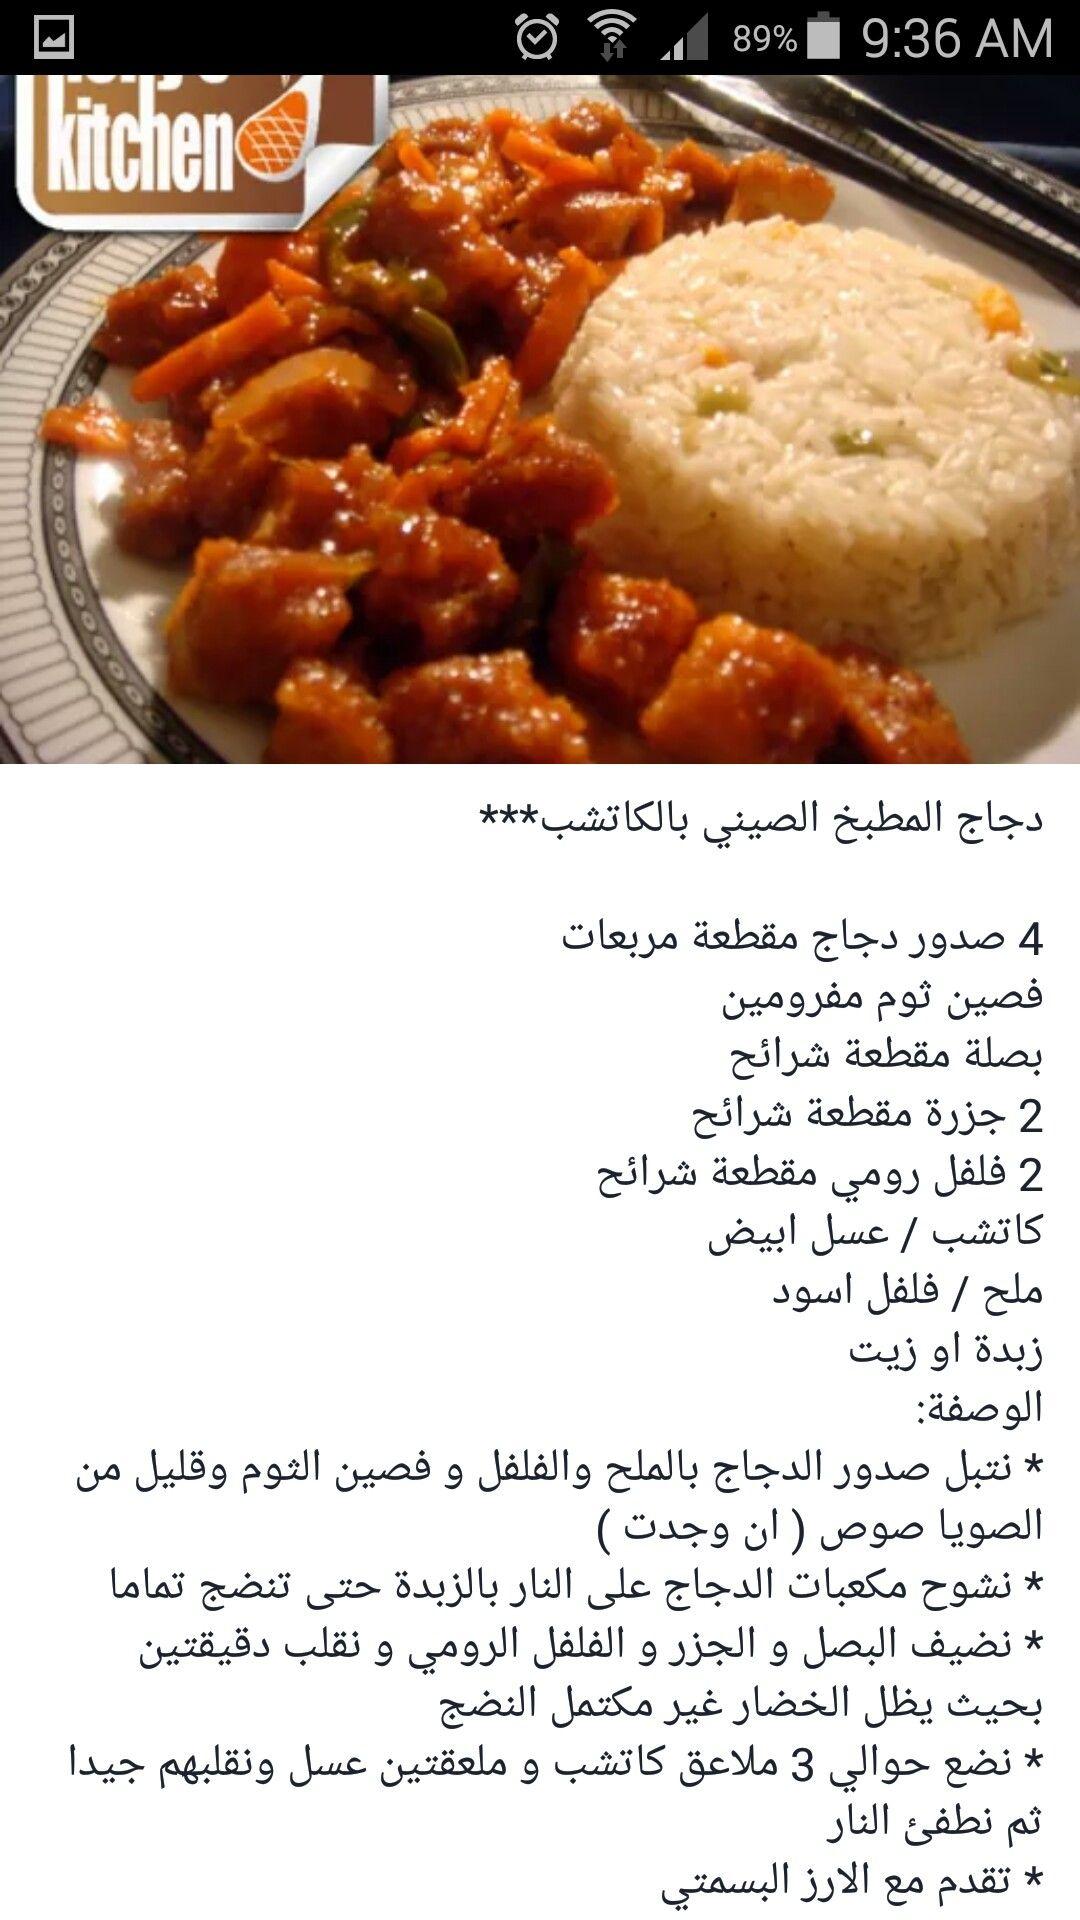 صدور الدجاج بالكاتشب Cookout Food Recipes Food Receipes